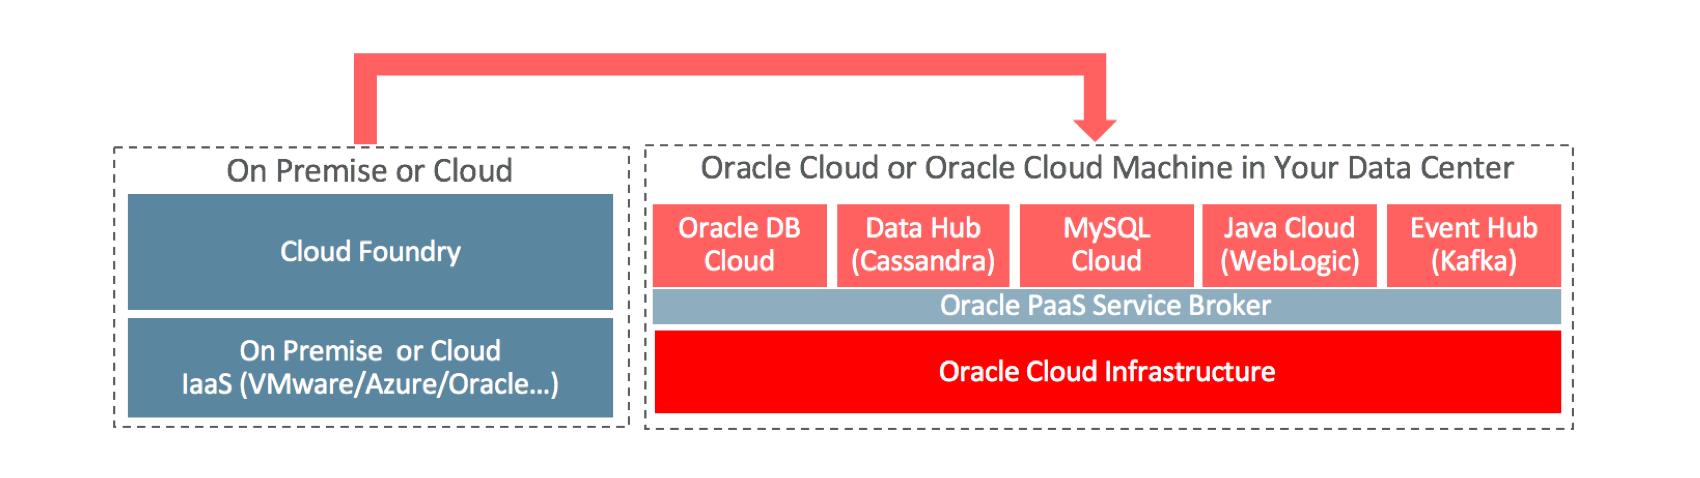 oracle-service-broker-cloud-foundry-for-Oracle-Cloud-Platform-PaaS